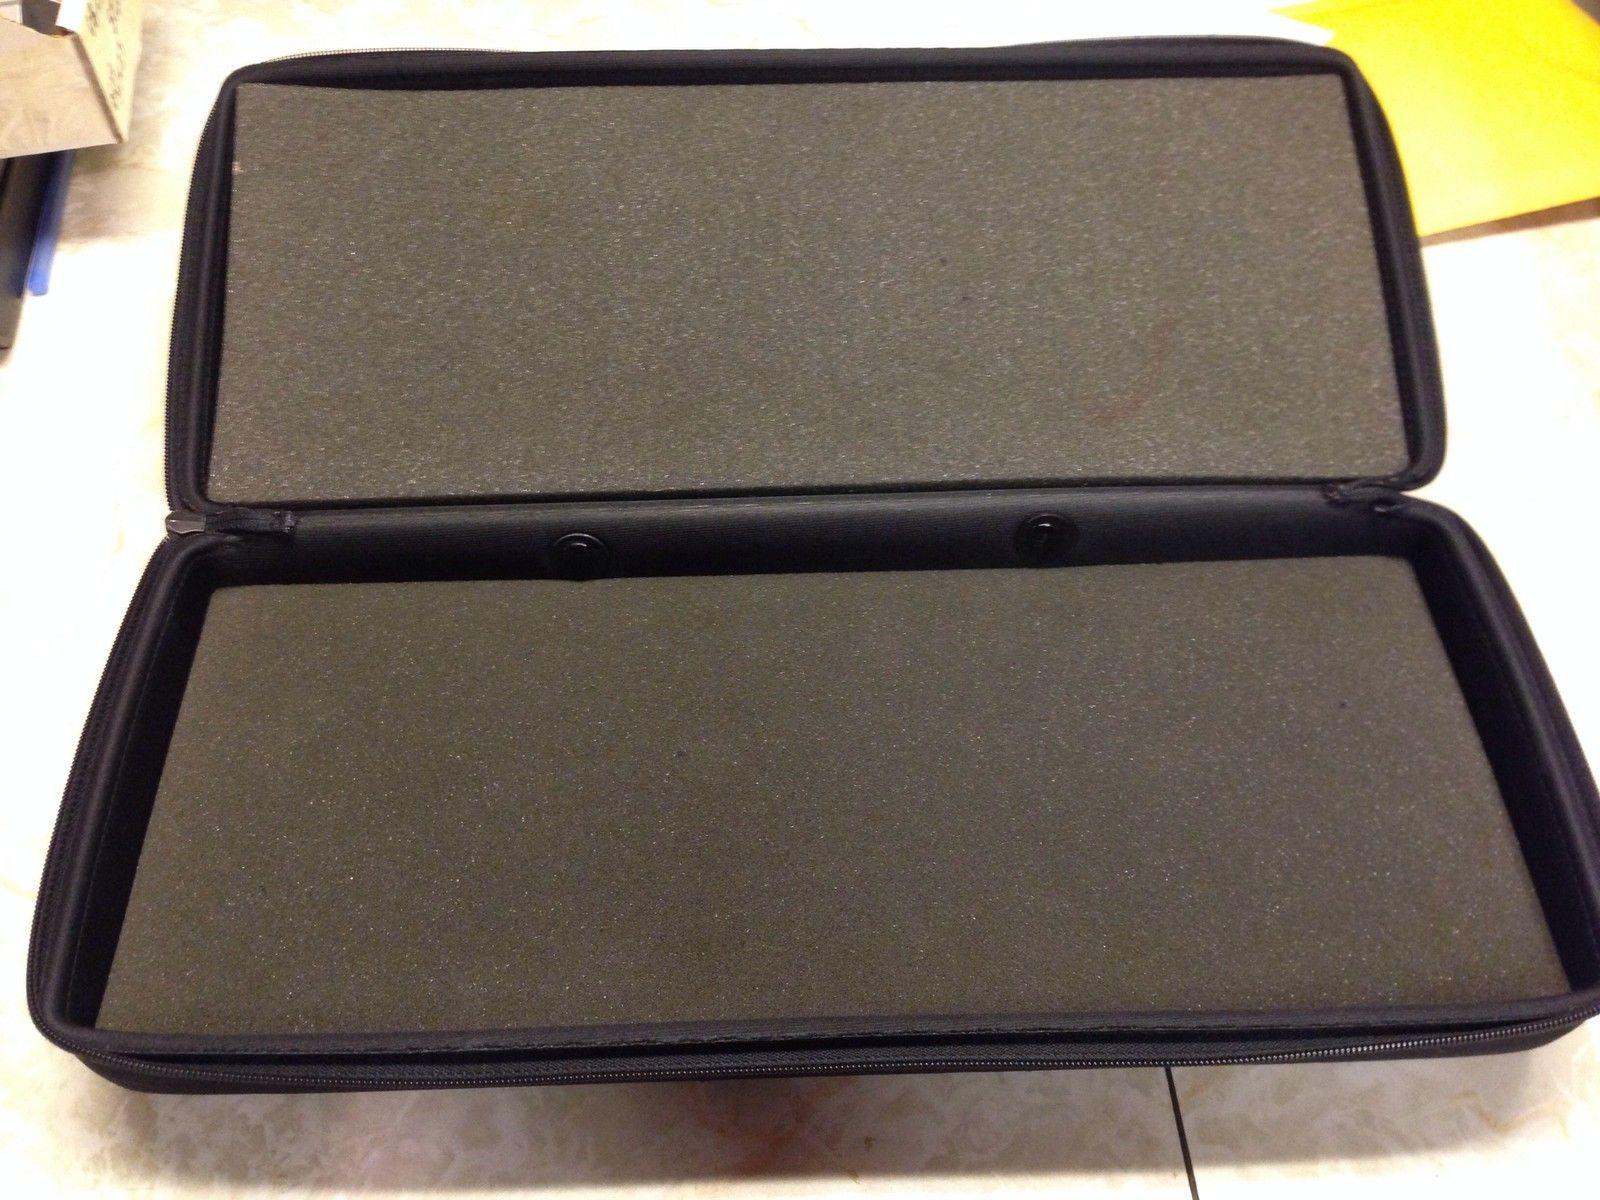 Oakley Sales Rep Case - WJL0cnp.jpg